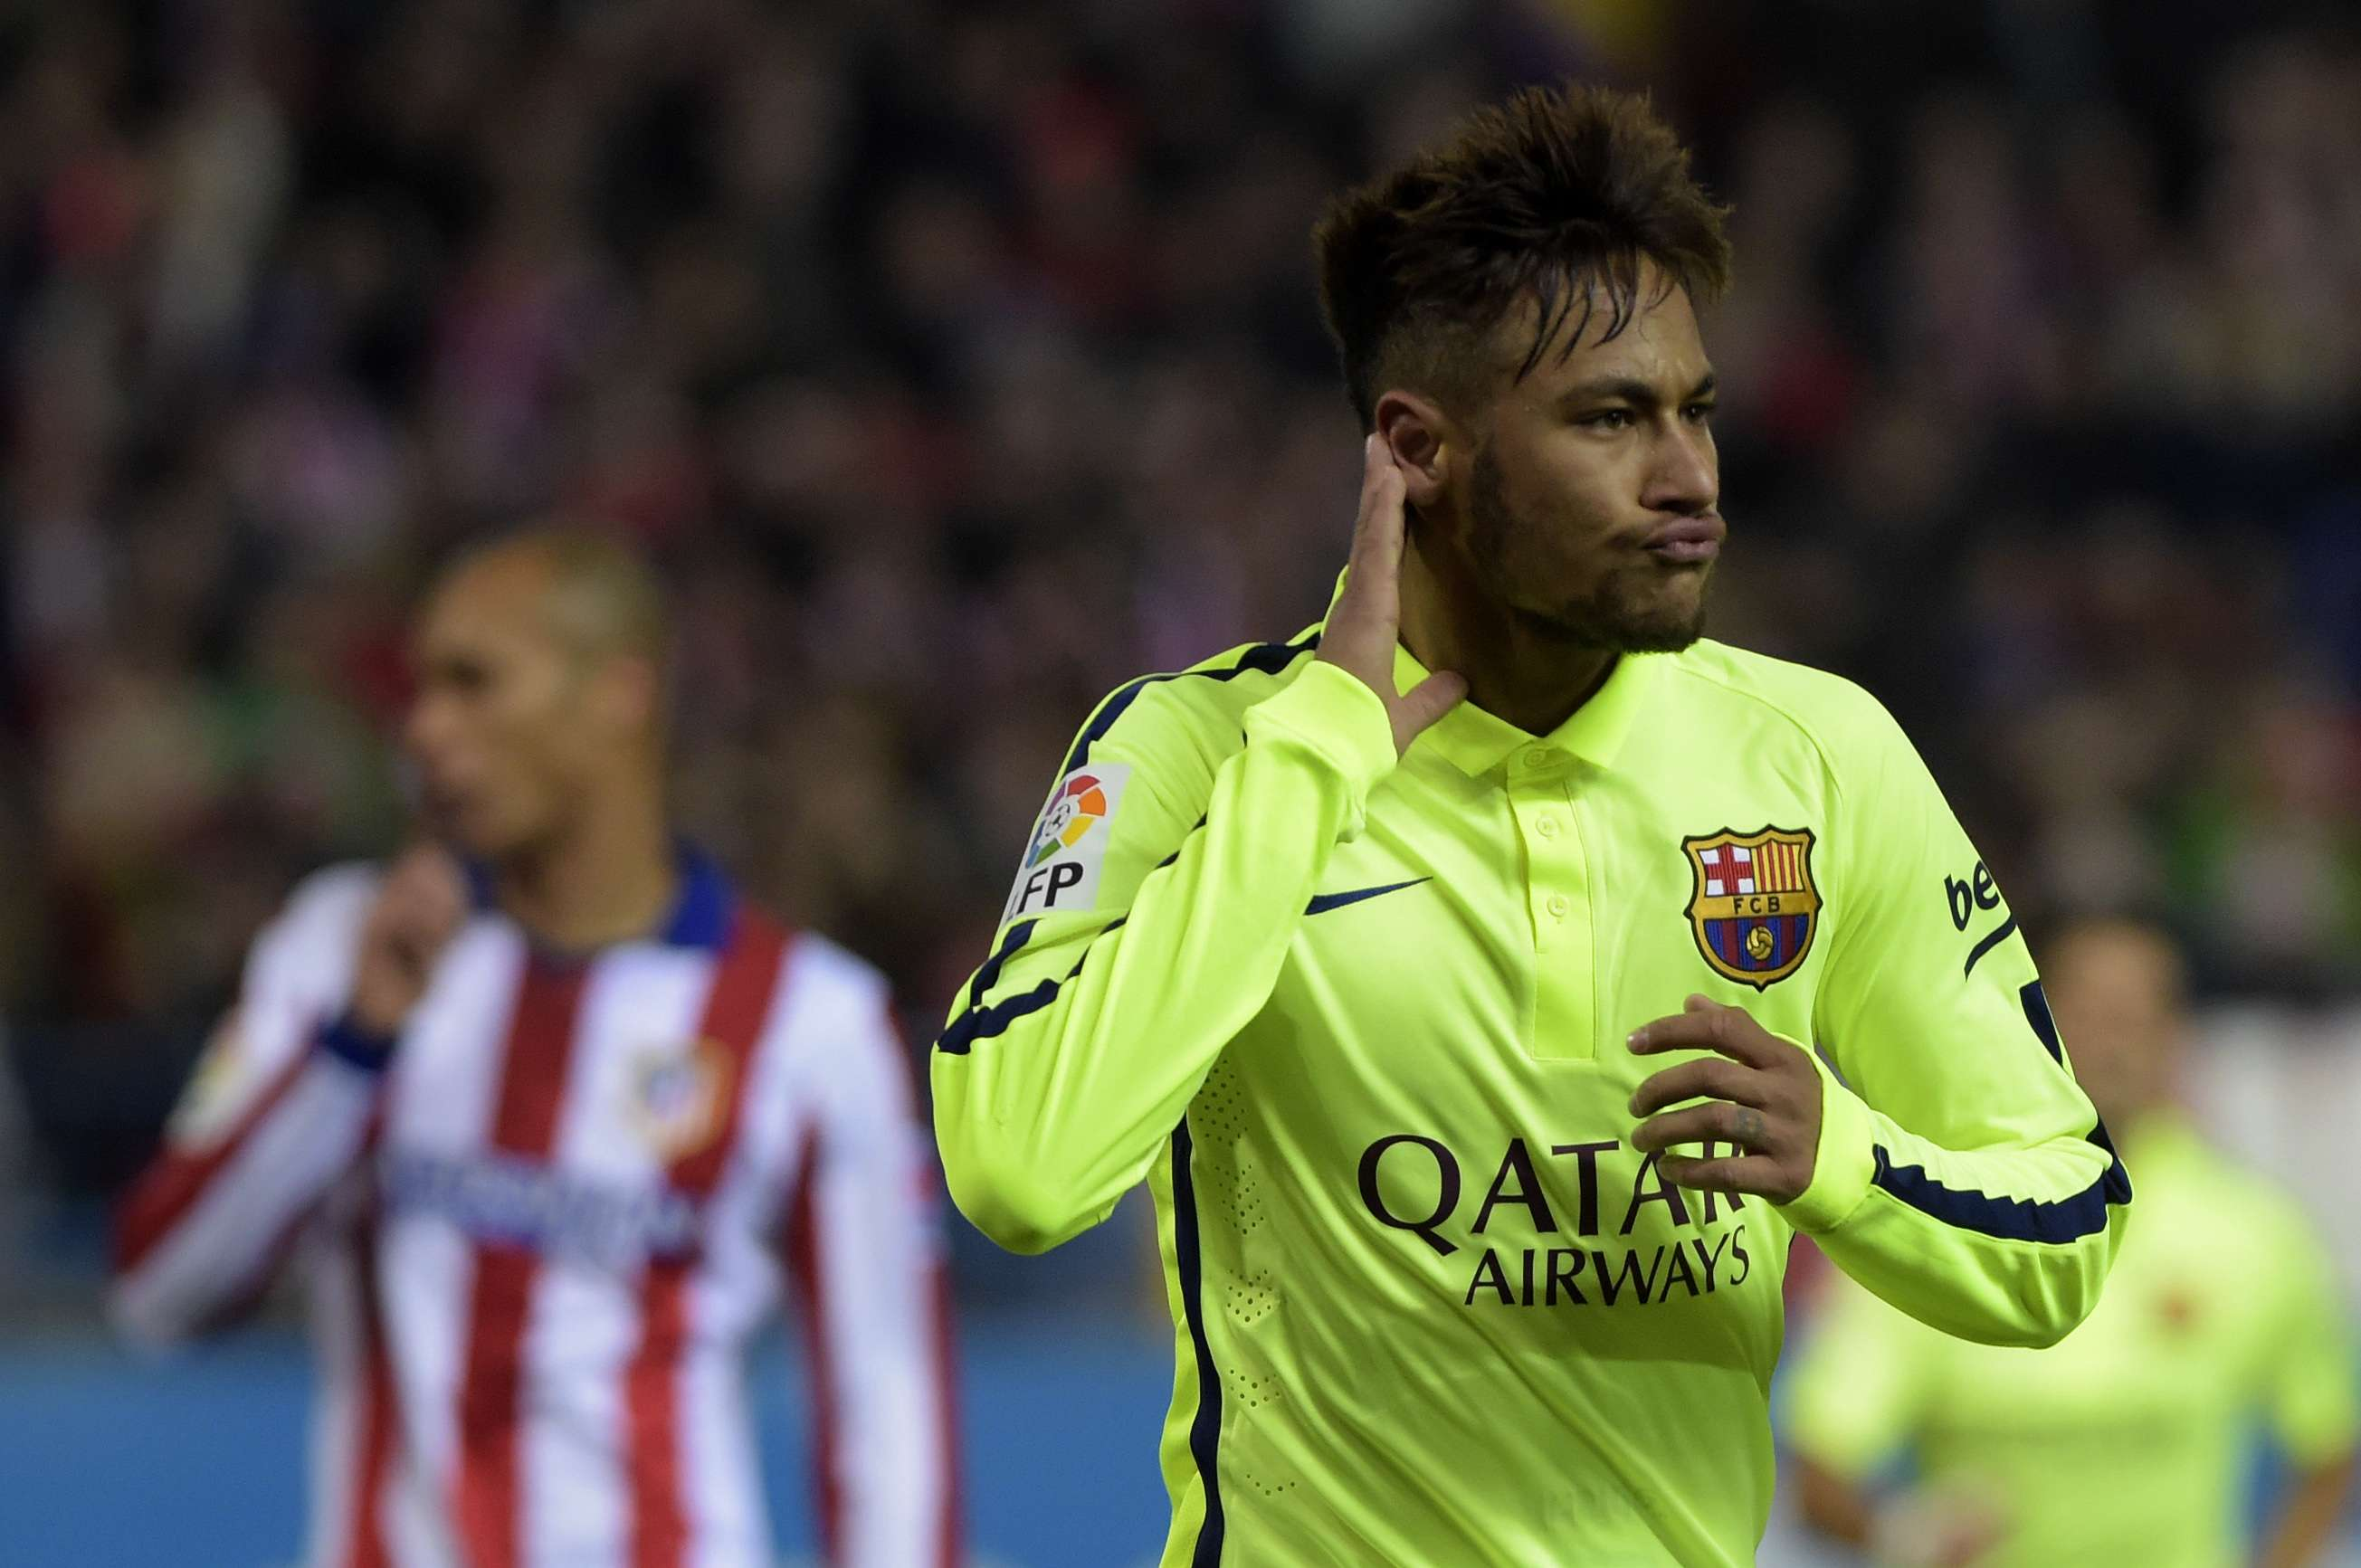 Neymar festeja belo gol no duelo contra o Atlético de Madrid Foto: Gerard Julien/AFP